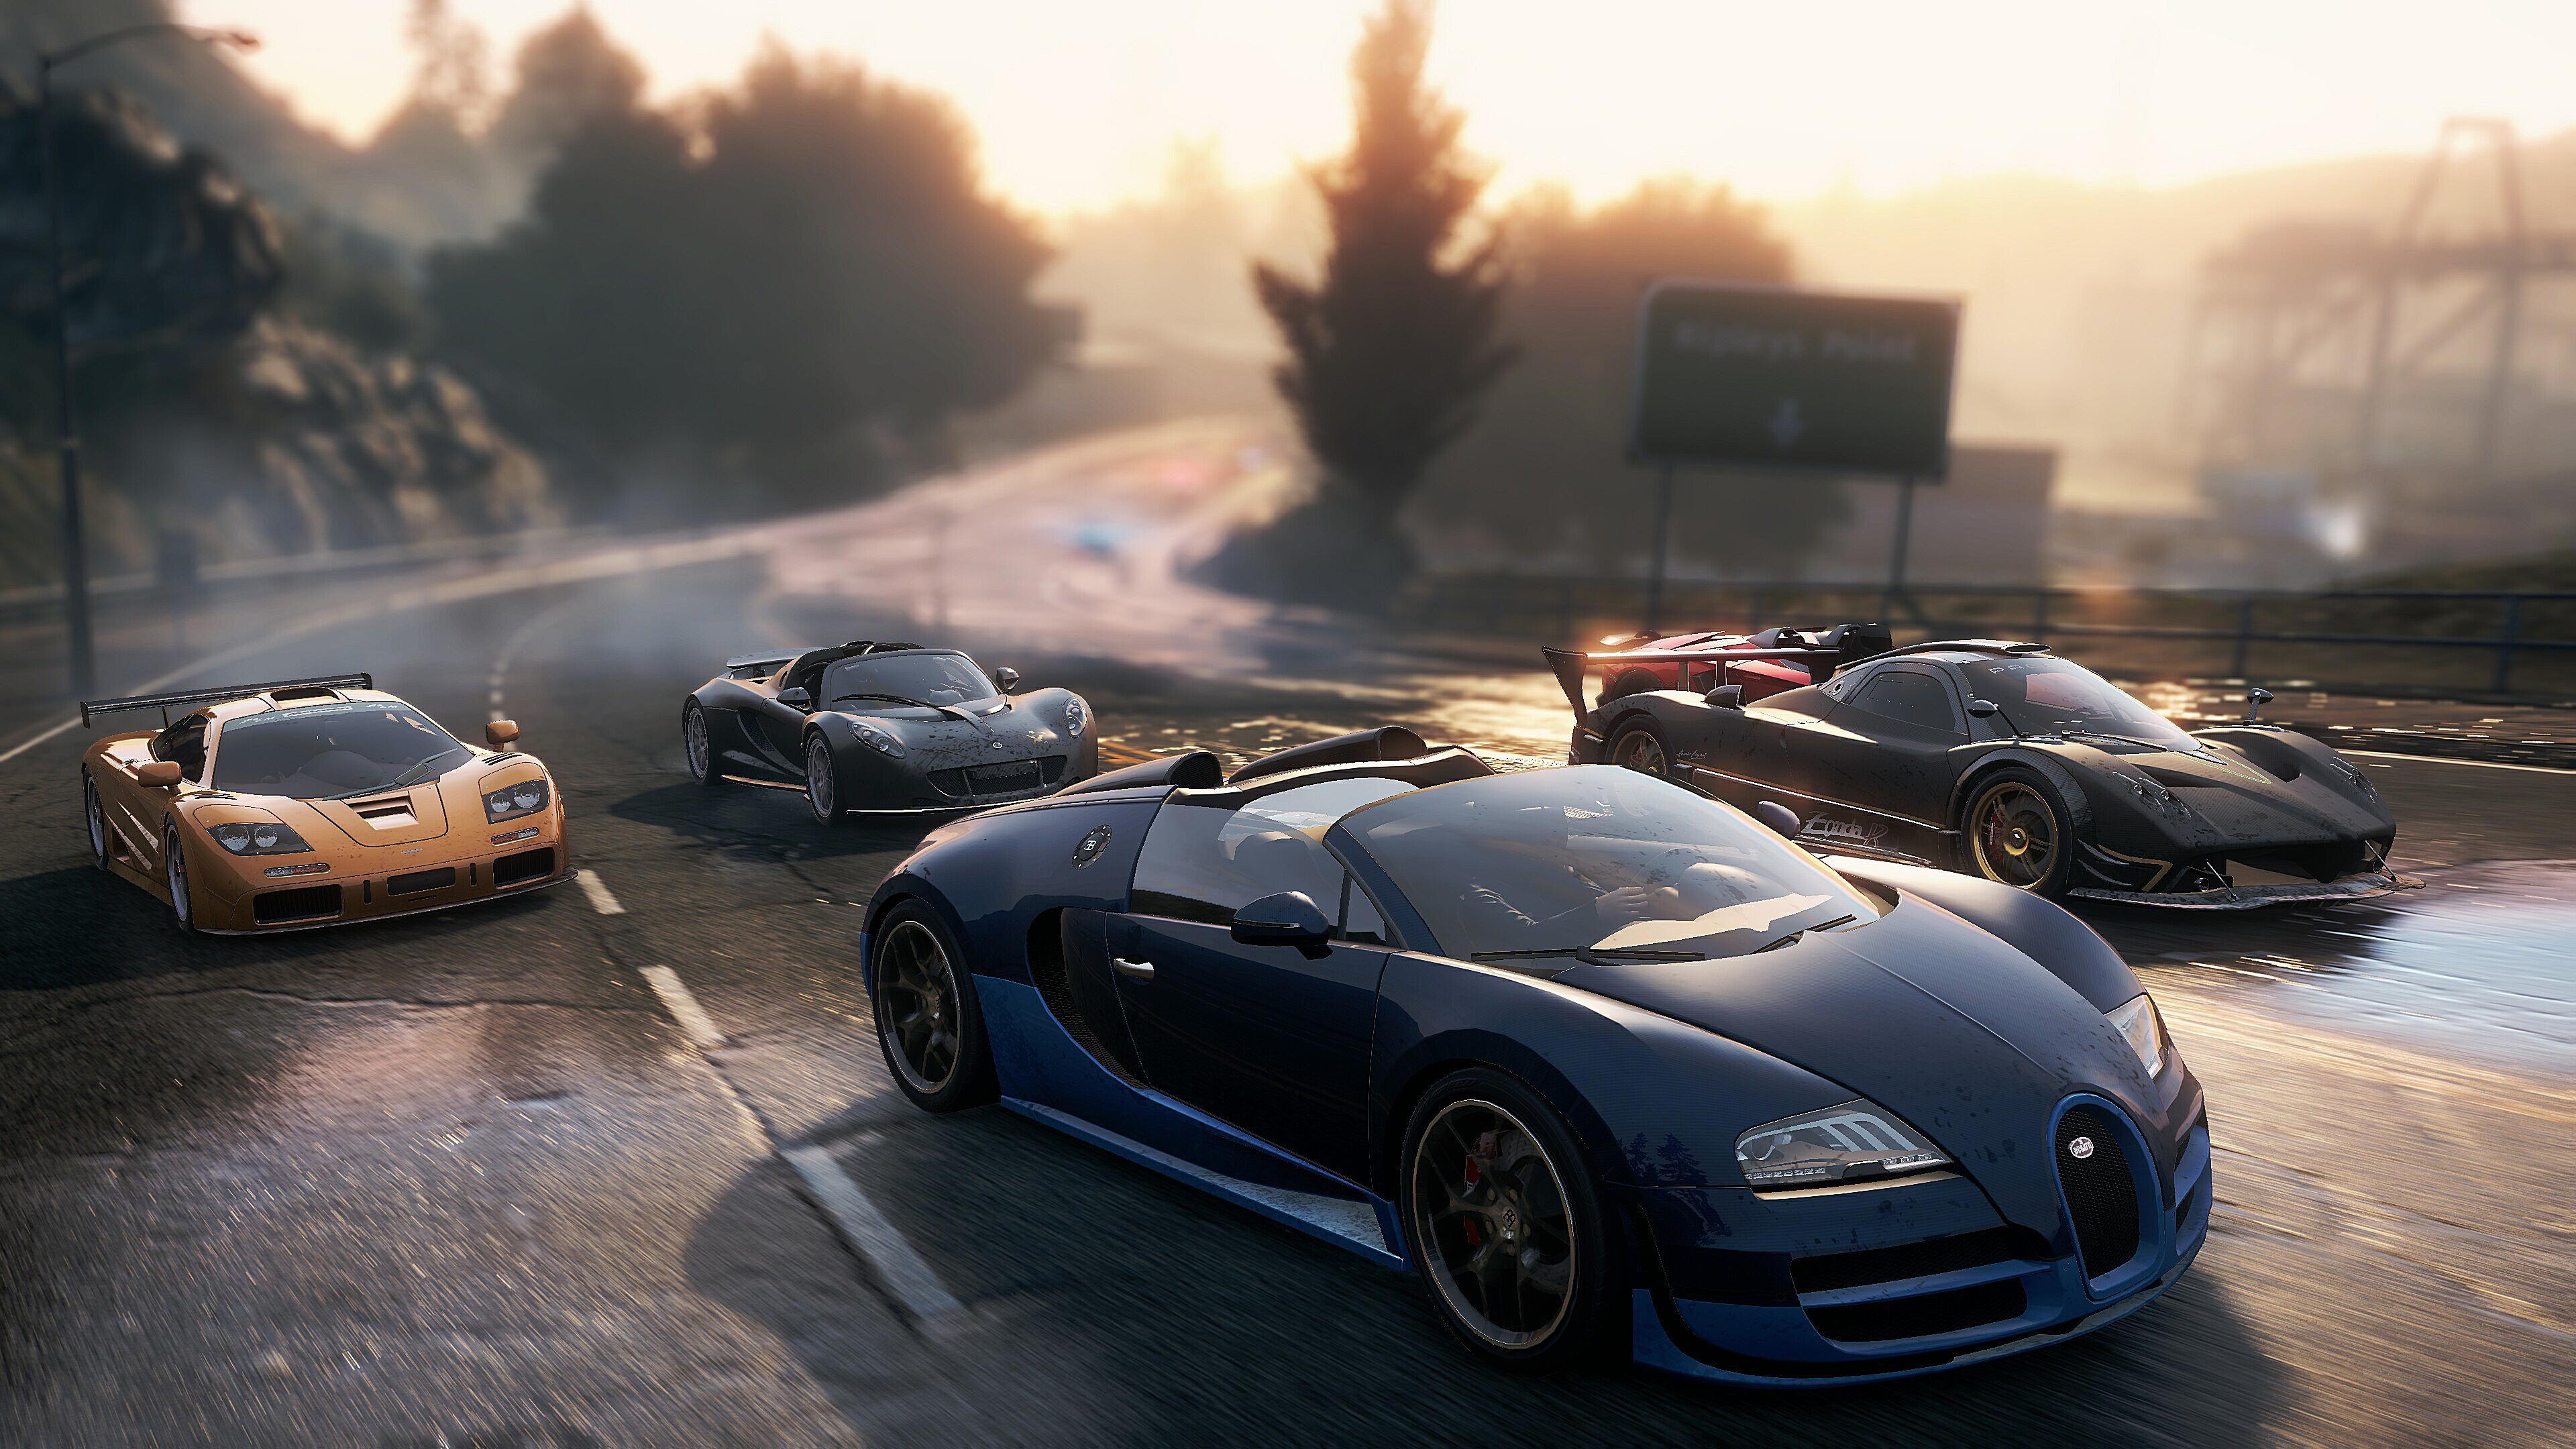 NeedForSpeedMostWanted-580702c75f9b5805c2f58685 Mesmerizing Bugatti Veyron Nfs Most Wanted Cars Trend